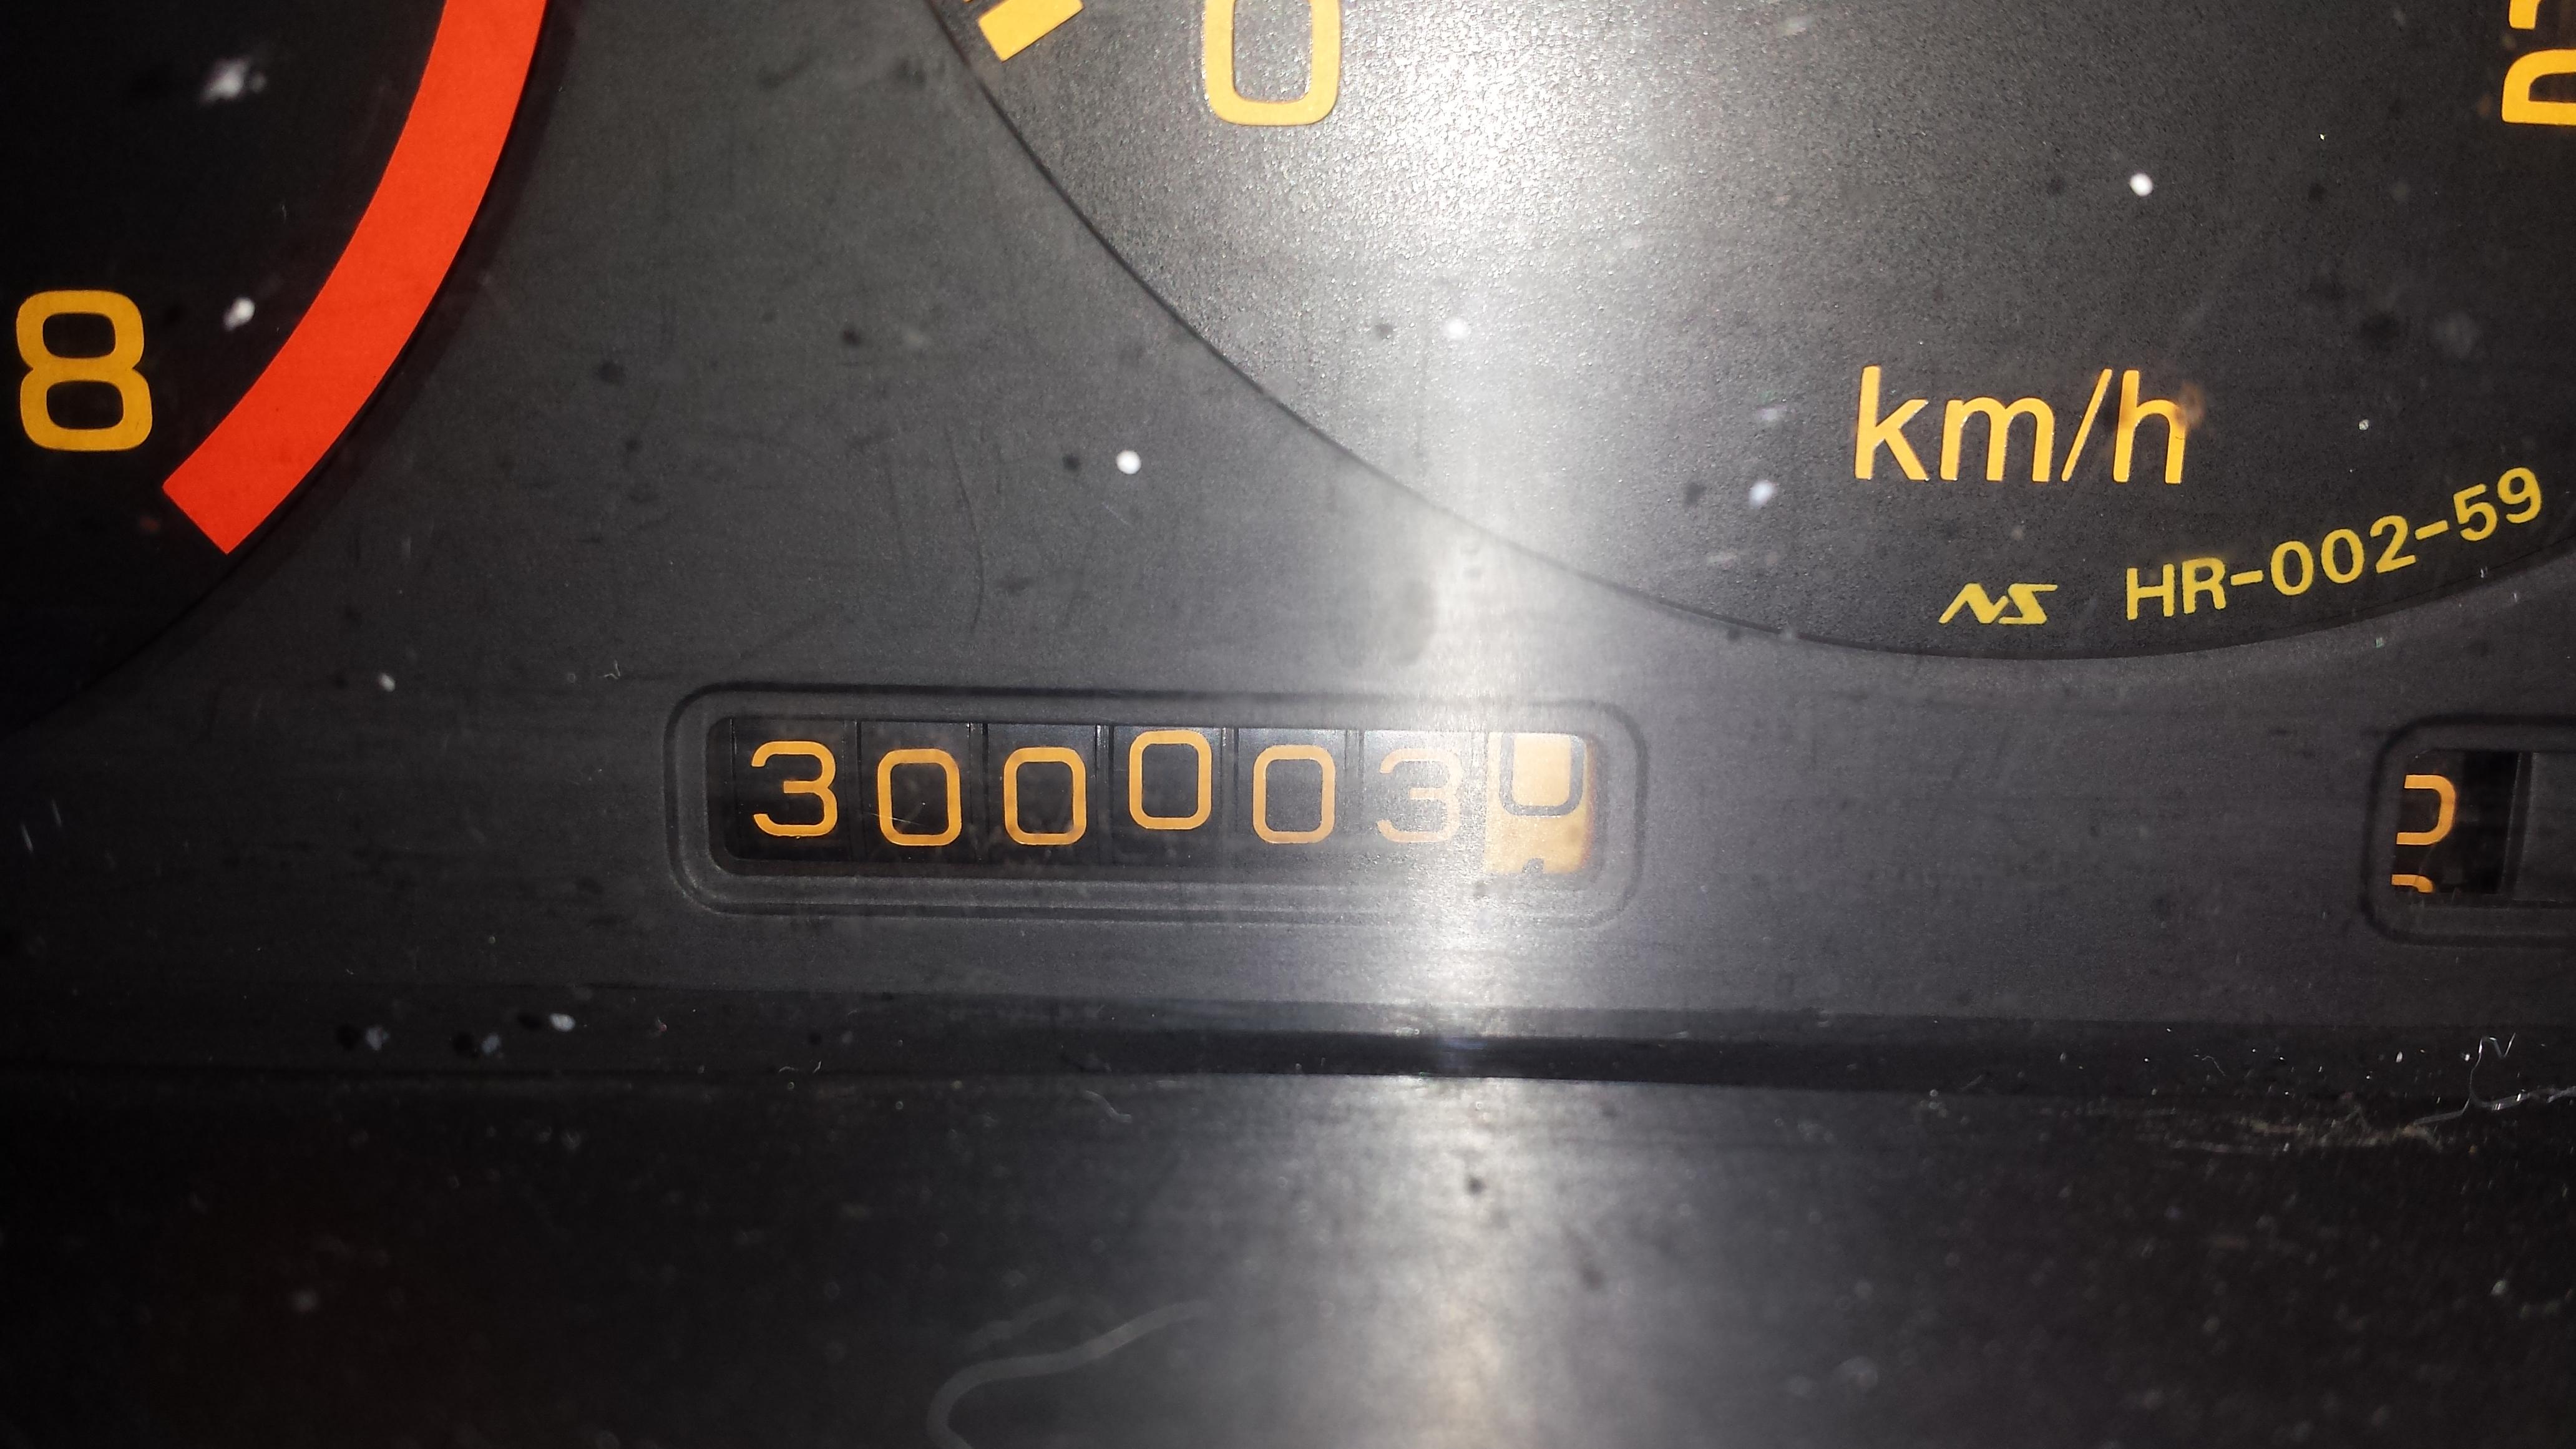 300003 kilometer !